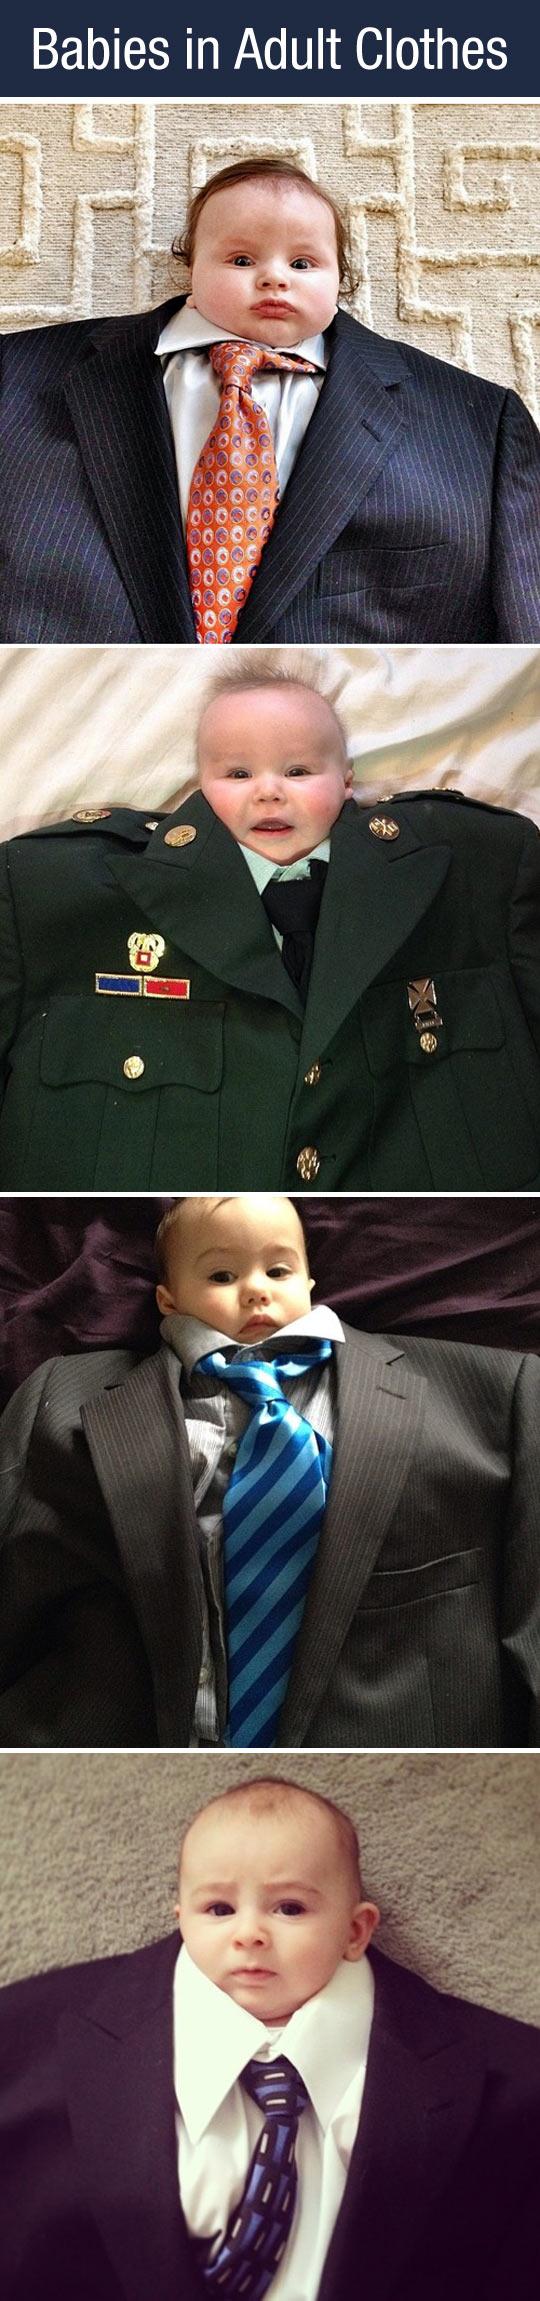 funny-babies-adult-clothes-suit